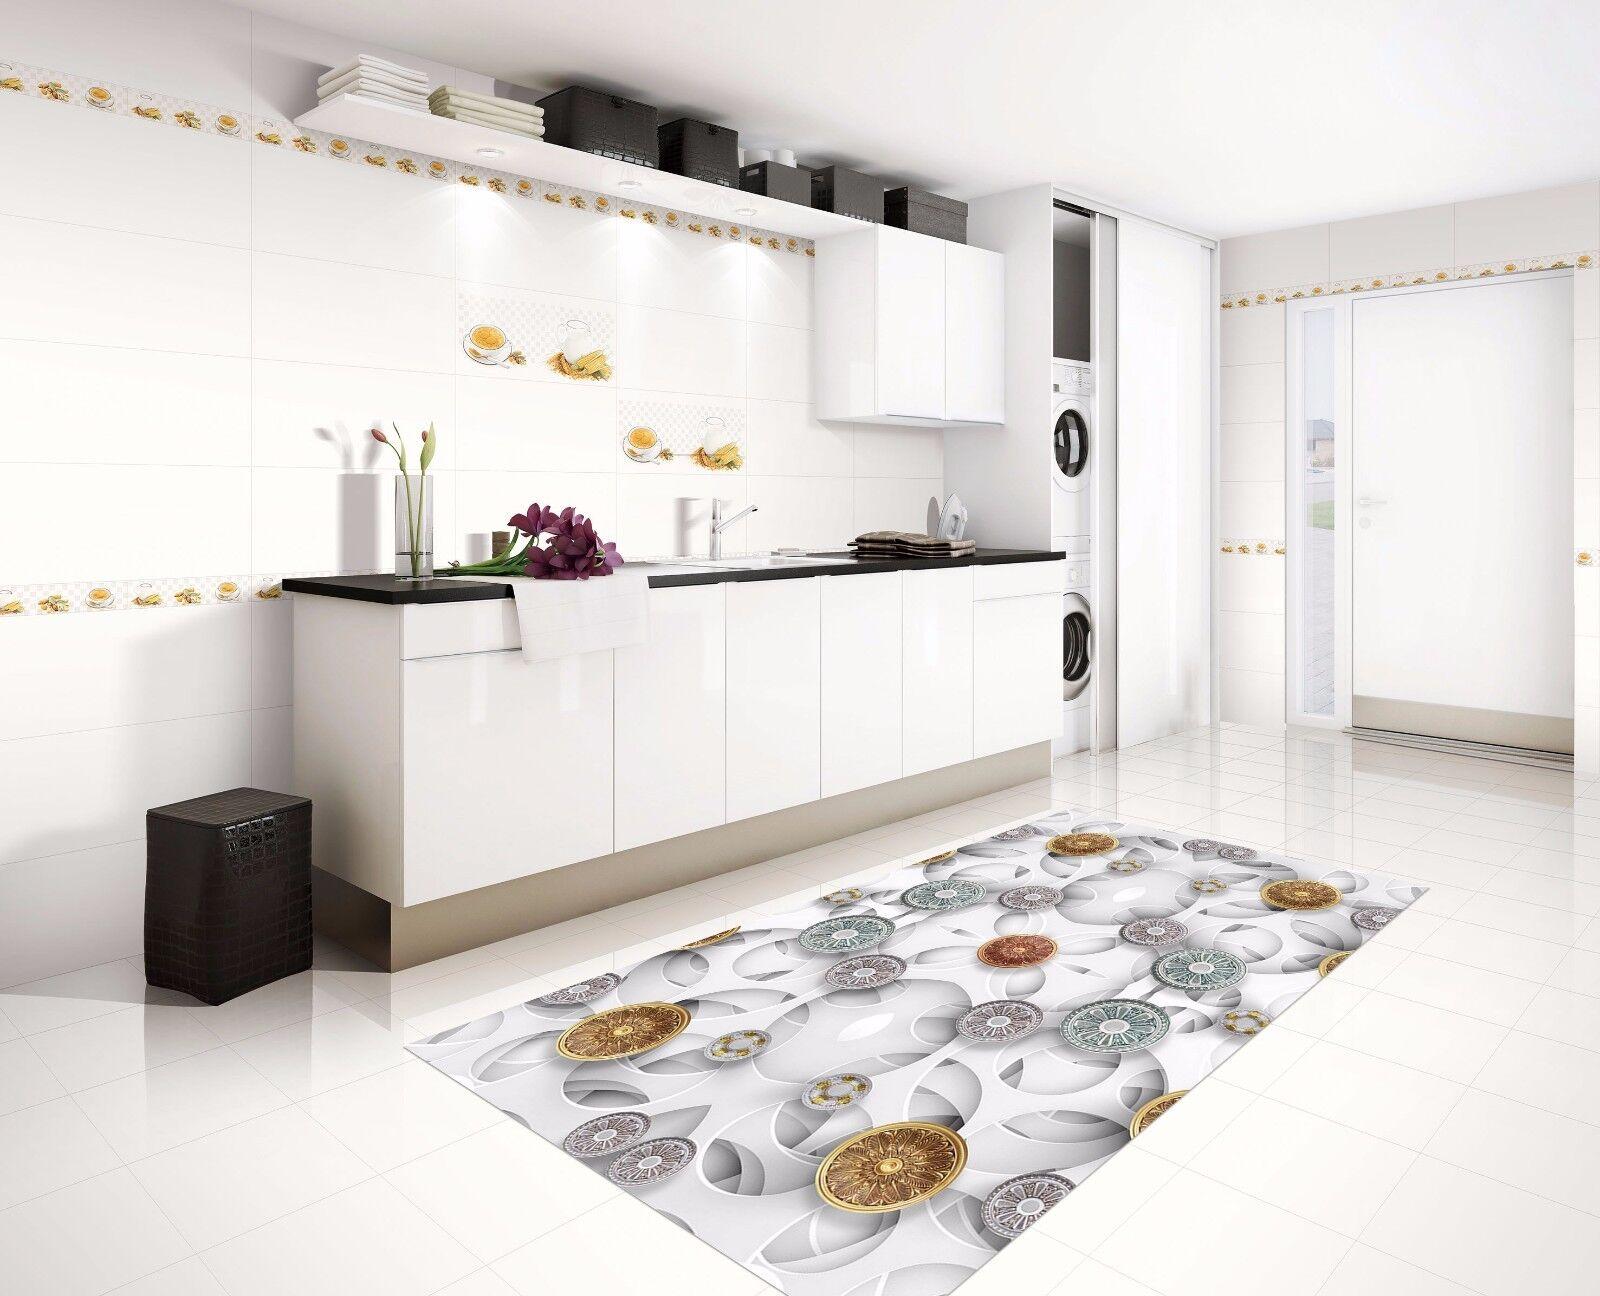 3D Pattern 725 Kitchen Mat Floor Murals Wall Print Wall AJ WALLPAPER UK Kyra